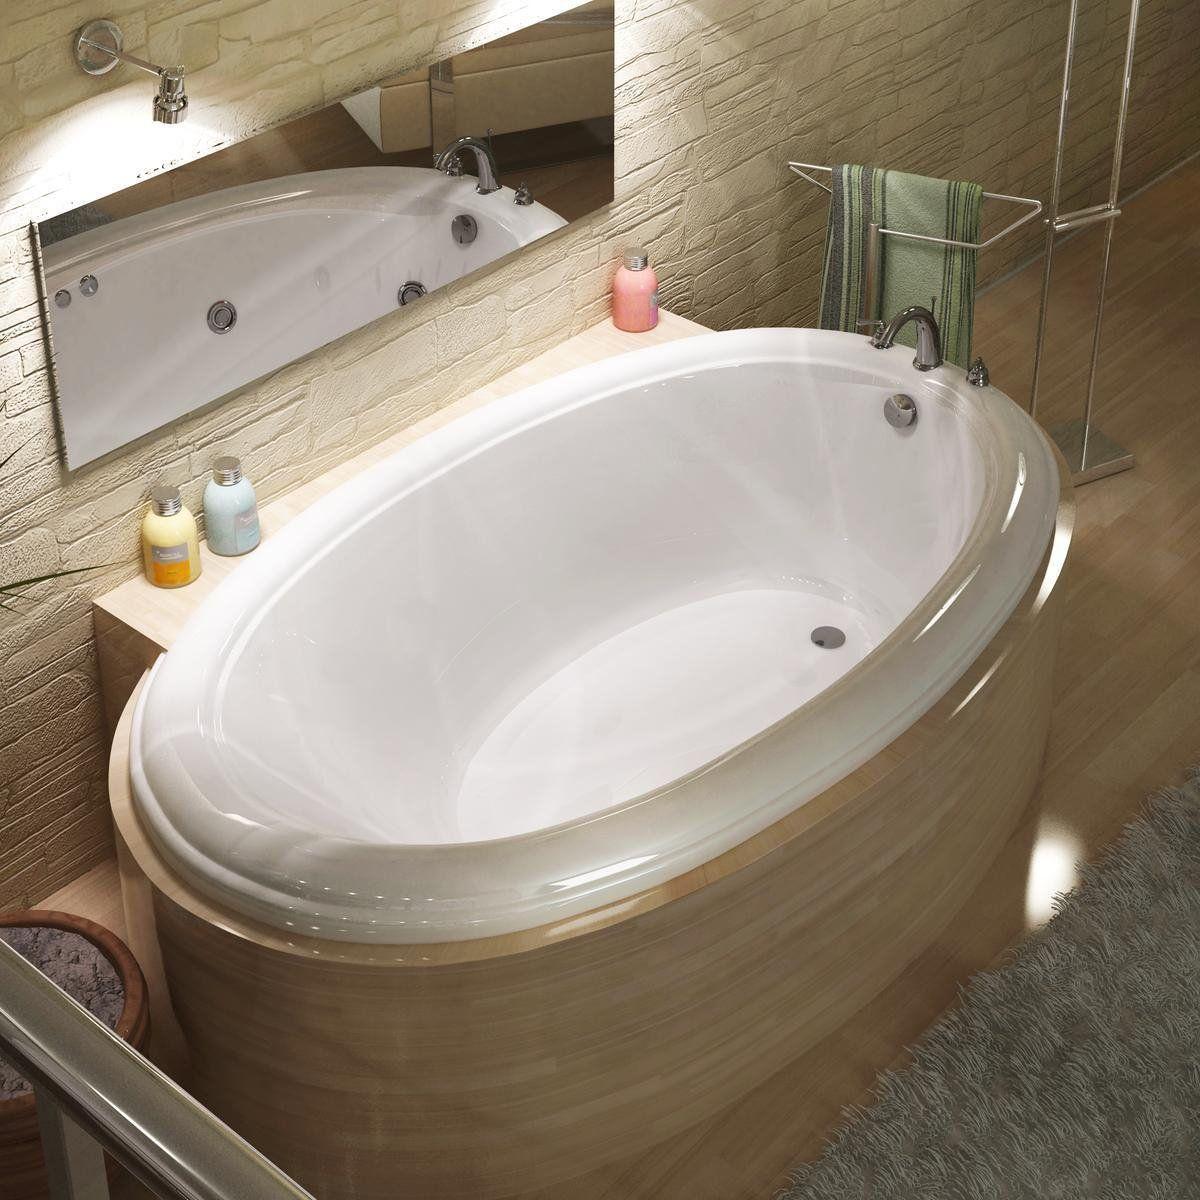 Atlantis 3660P Petite Oval Tub | Master Bath | Pinterest | Tubs ...